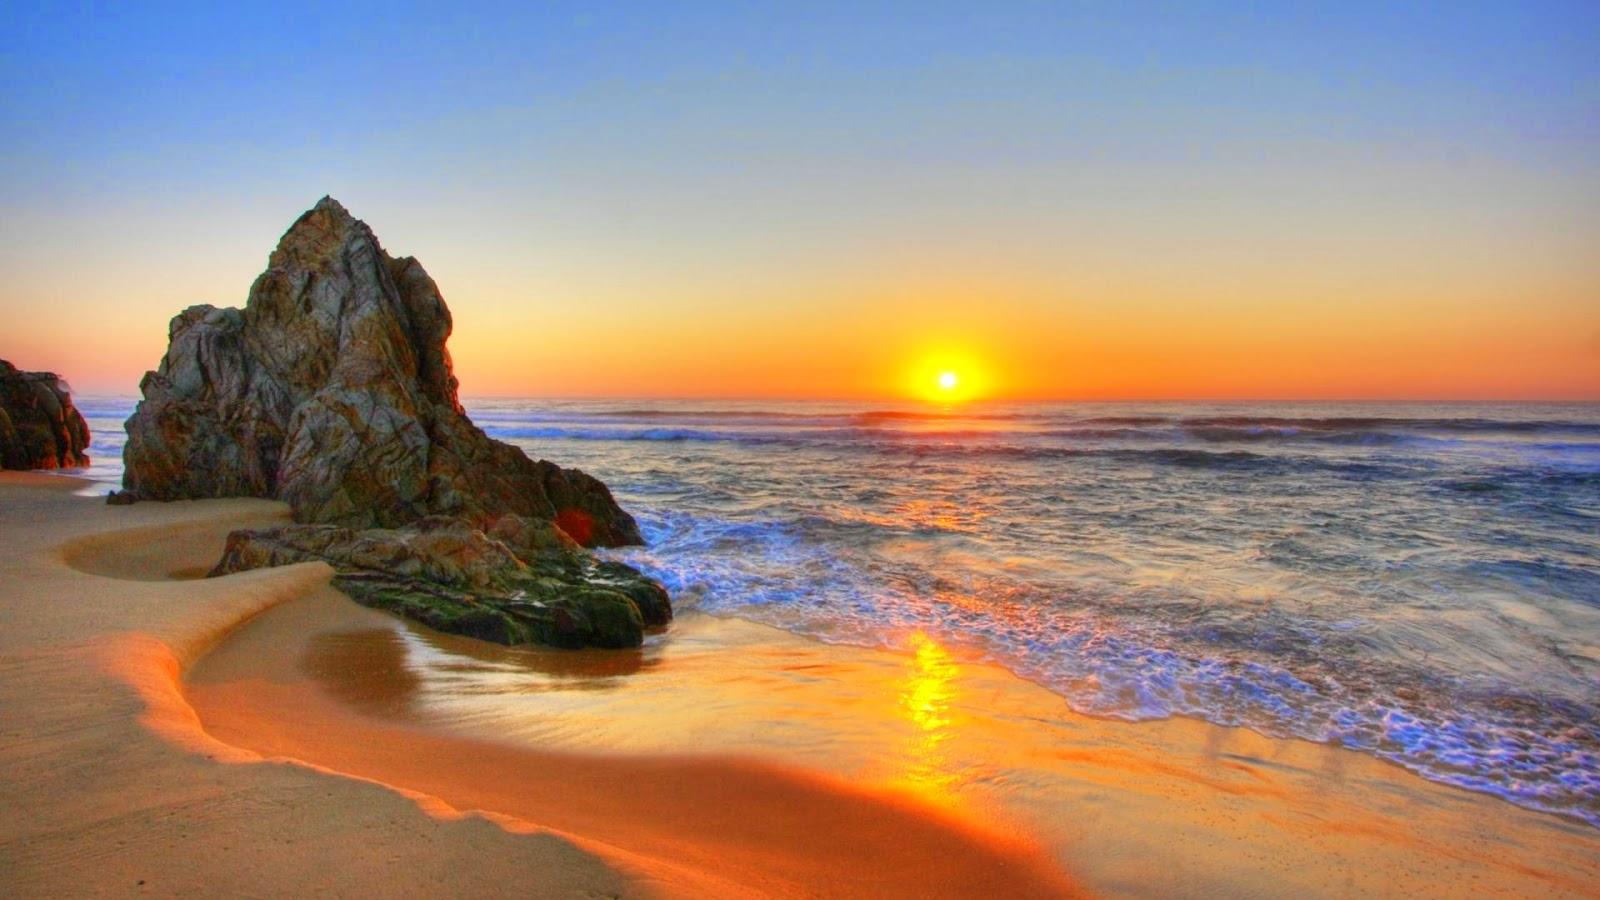 Hd wallpaper editor - Beach Free Download Wallpaper Beach Photo Hd Beach Image Beach Picture Beach